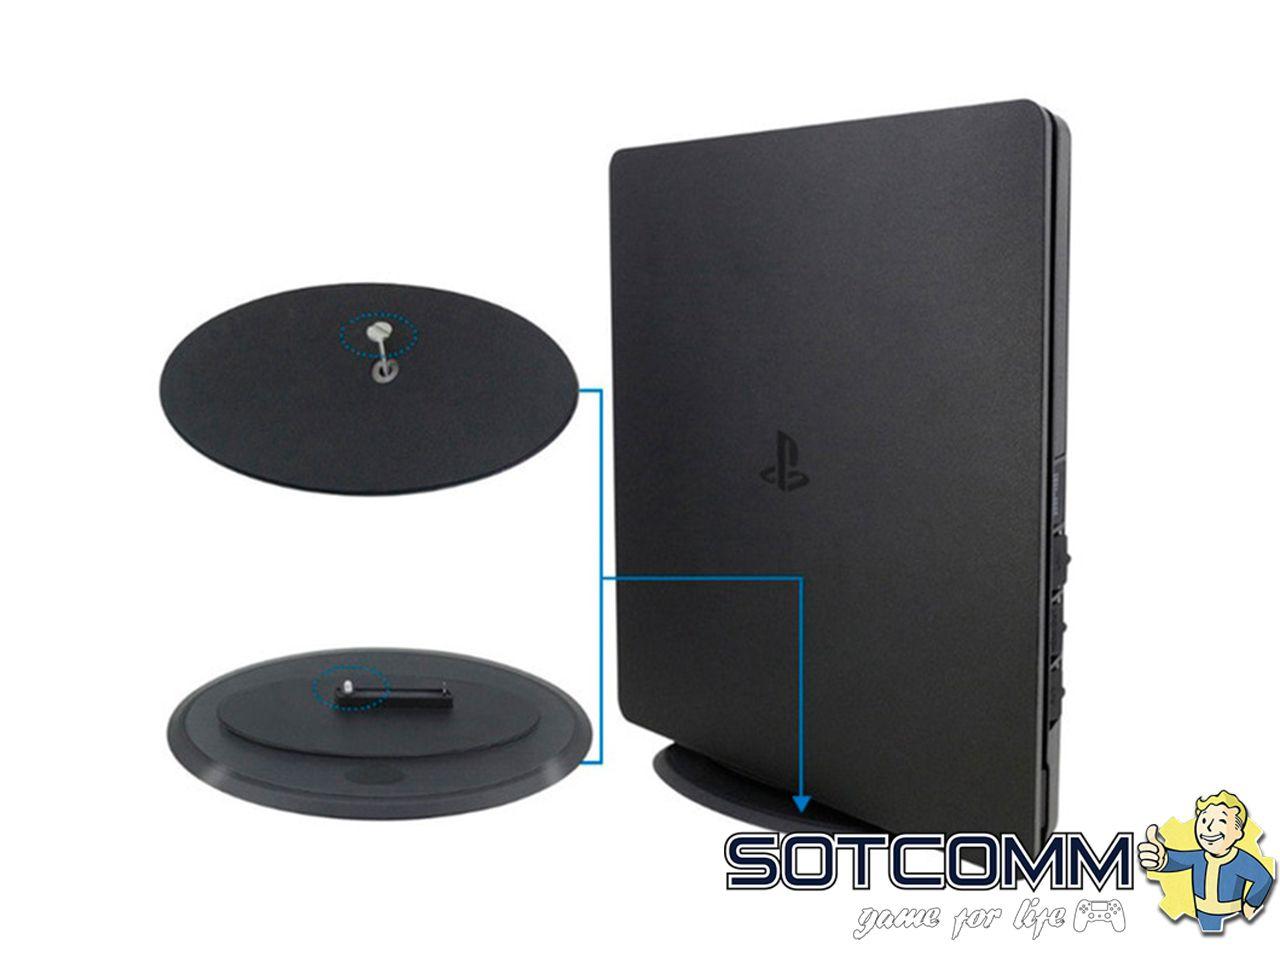 Вертикальная подставка OIVO Stand Vertical Universal 2in1 для PS4 Slim/Pro